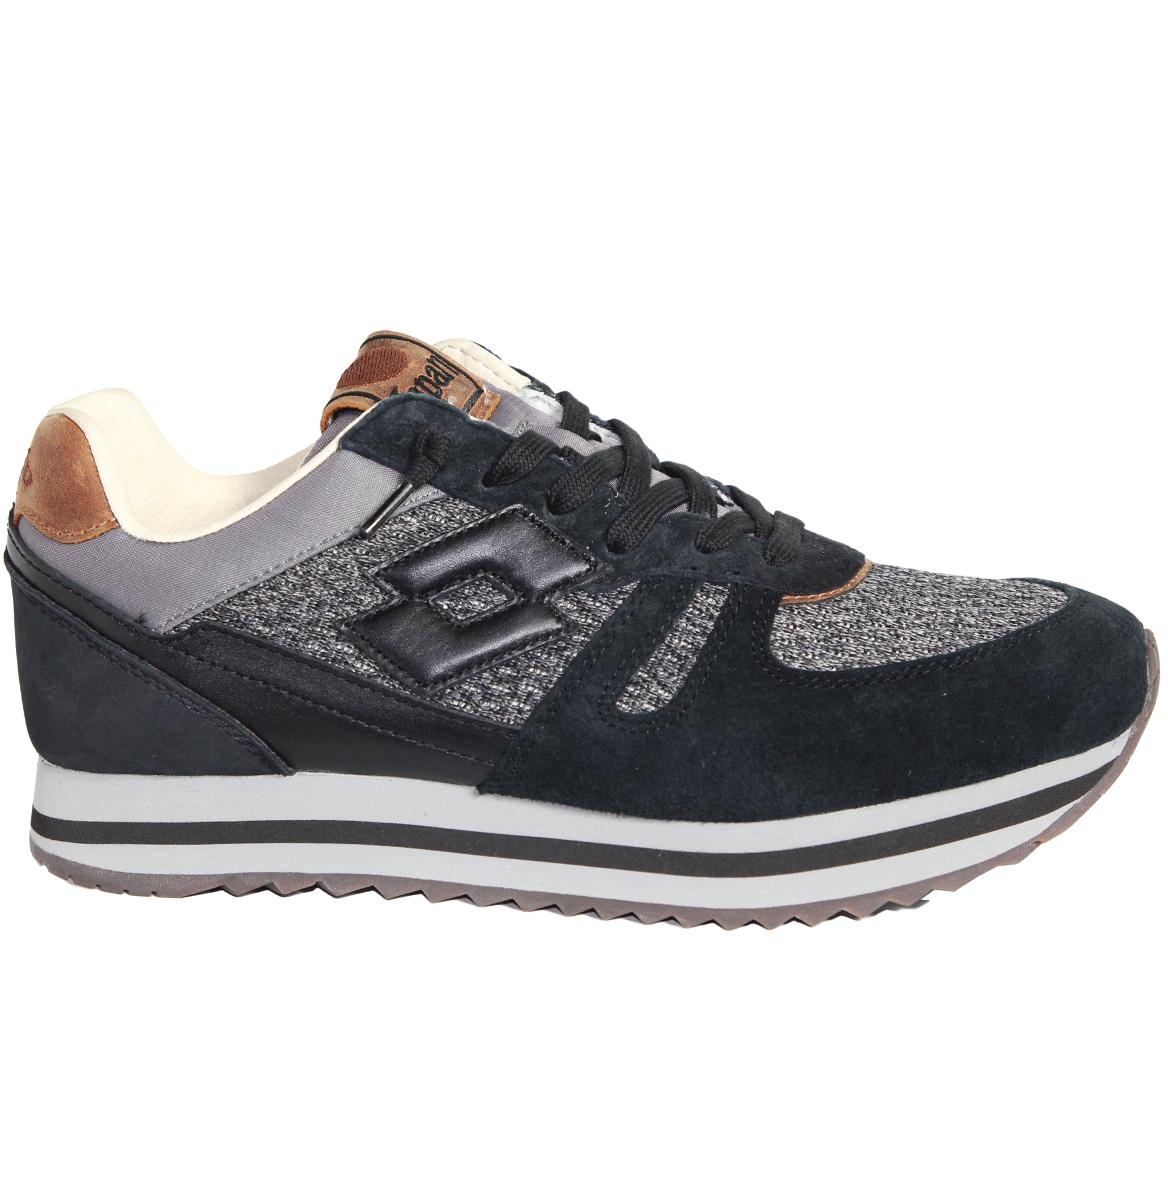 zapatos hombres LOTTO LEGGENDA RHAZHE T0827 negro gris ORIGINALE